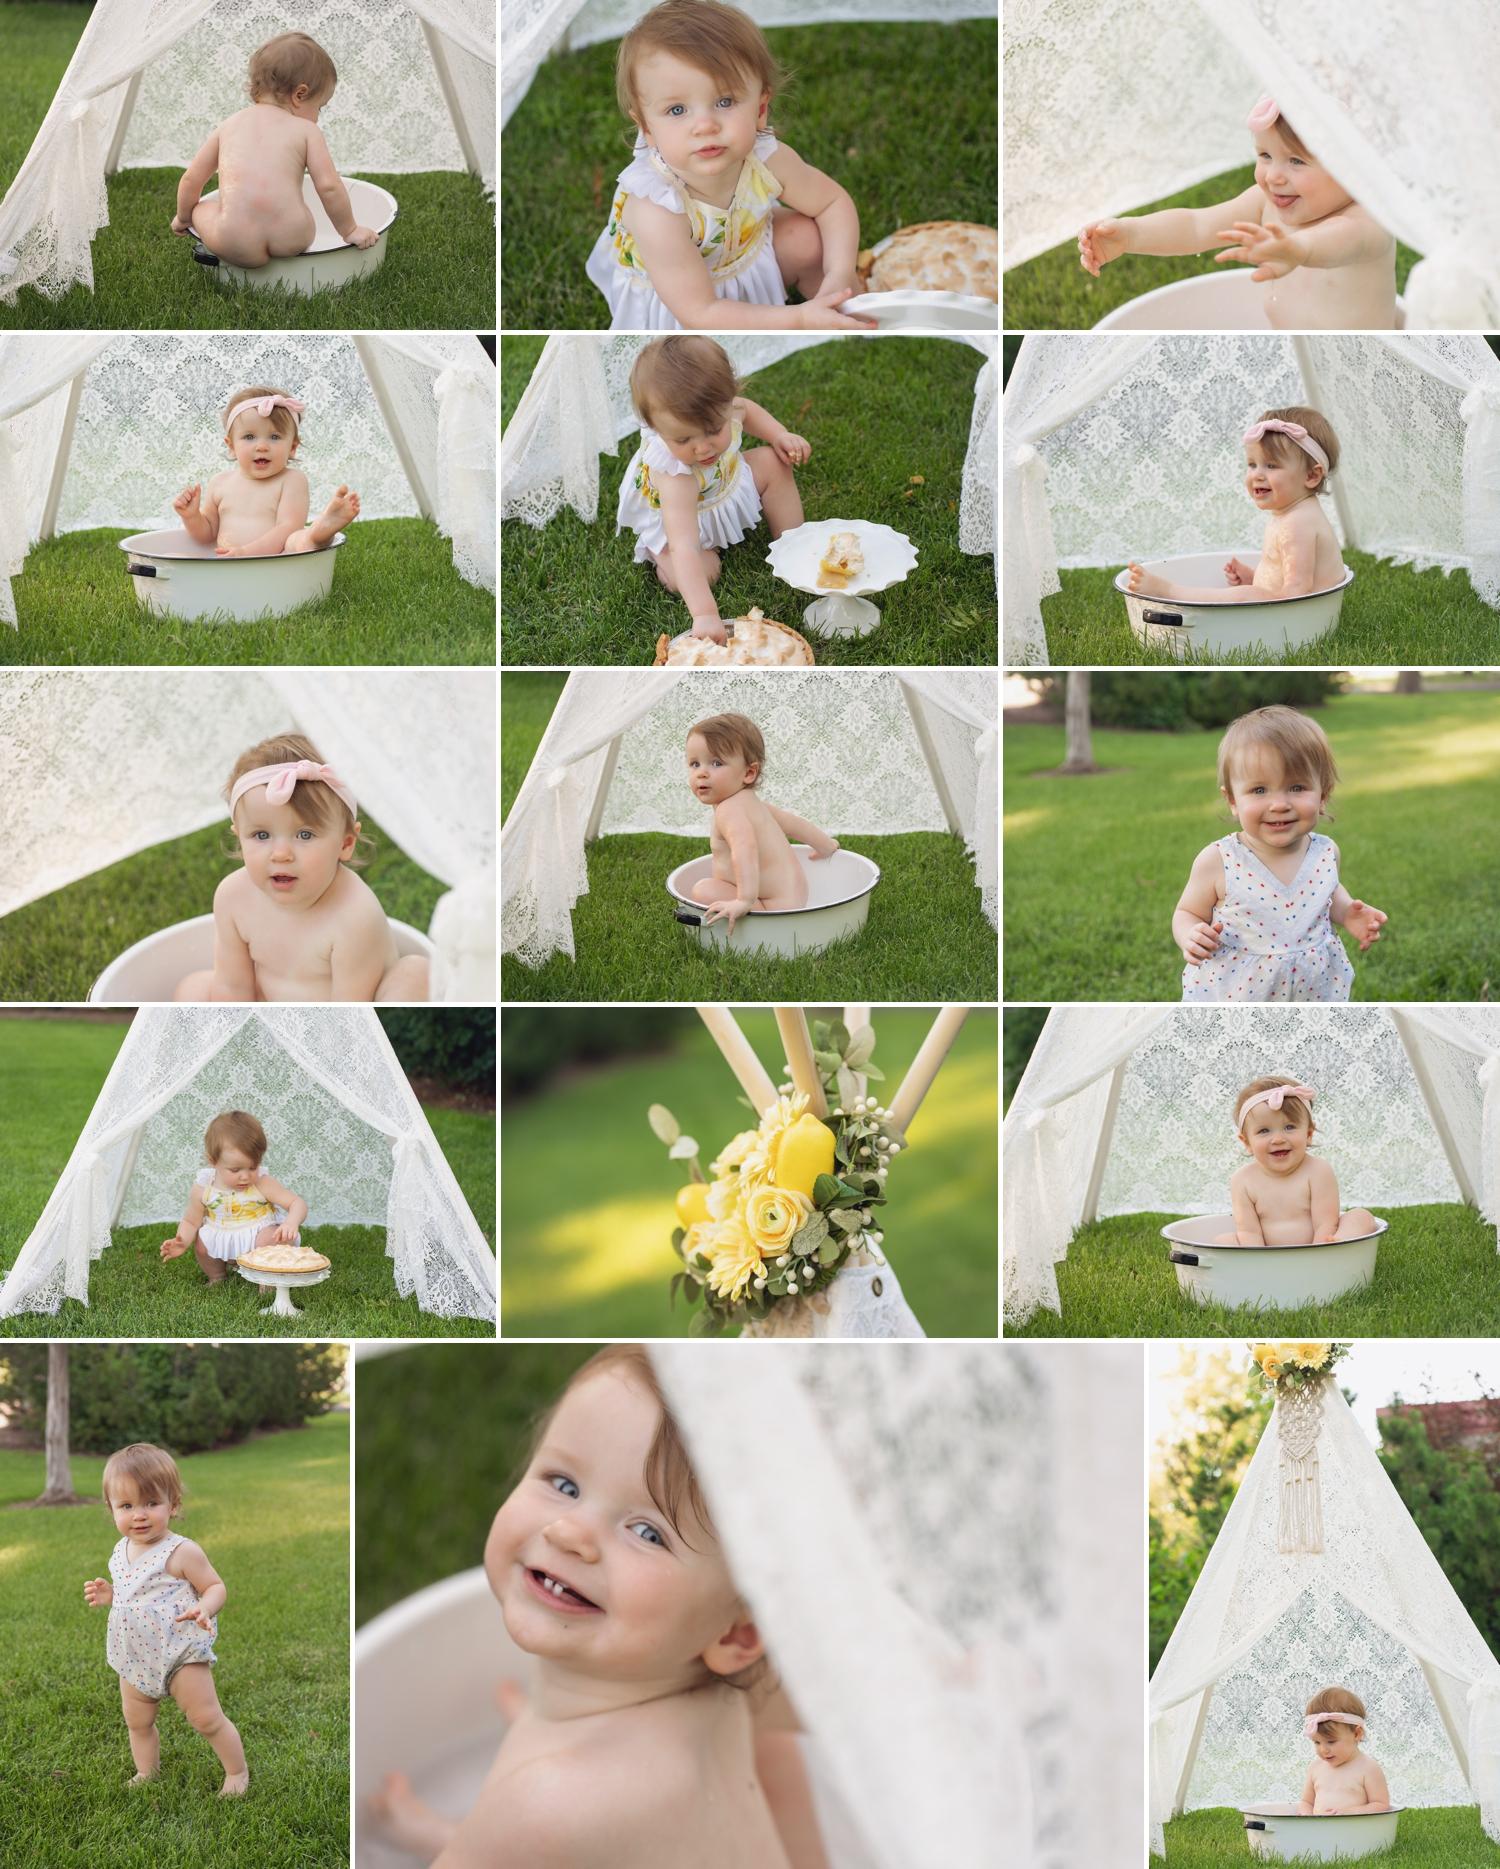 Baby plan - 1 year 2.jpg